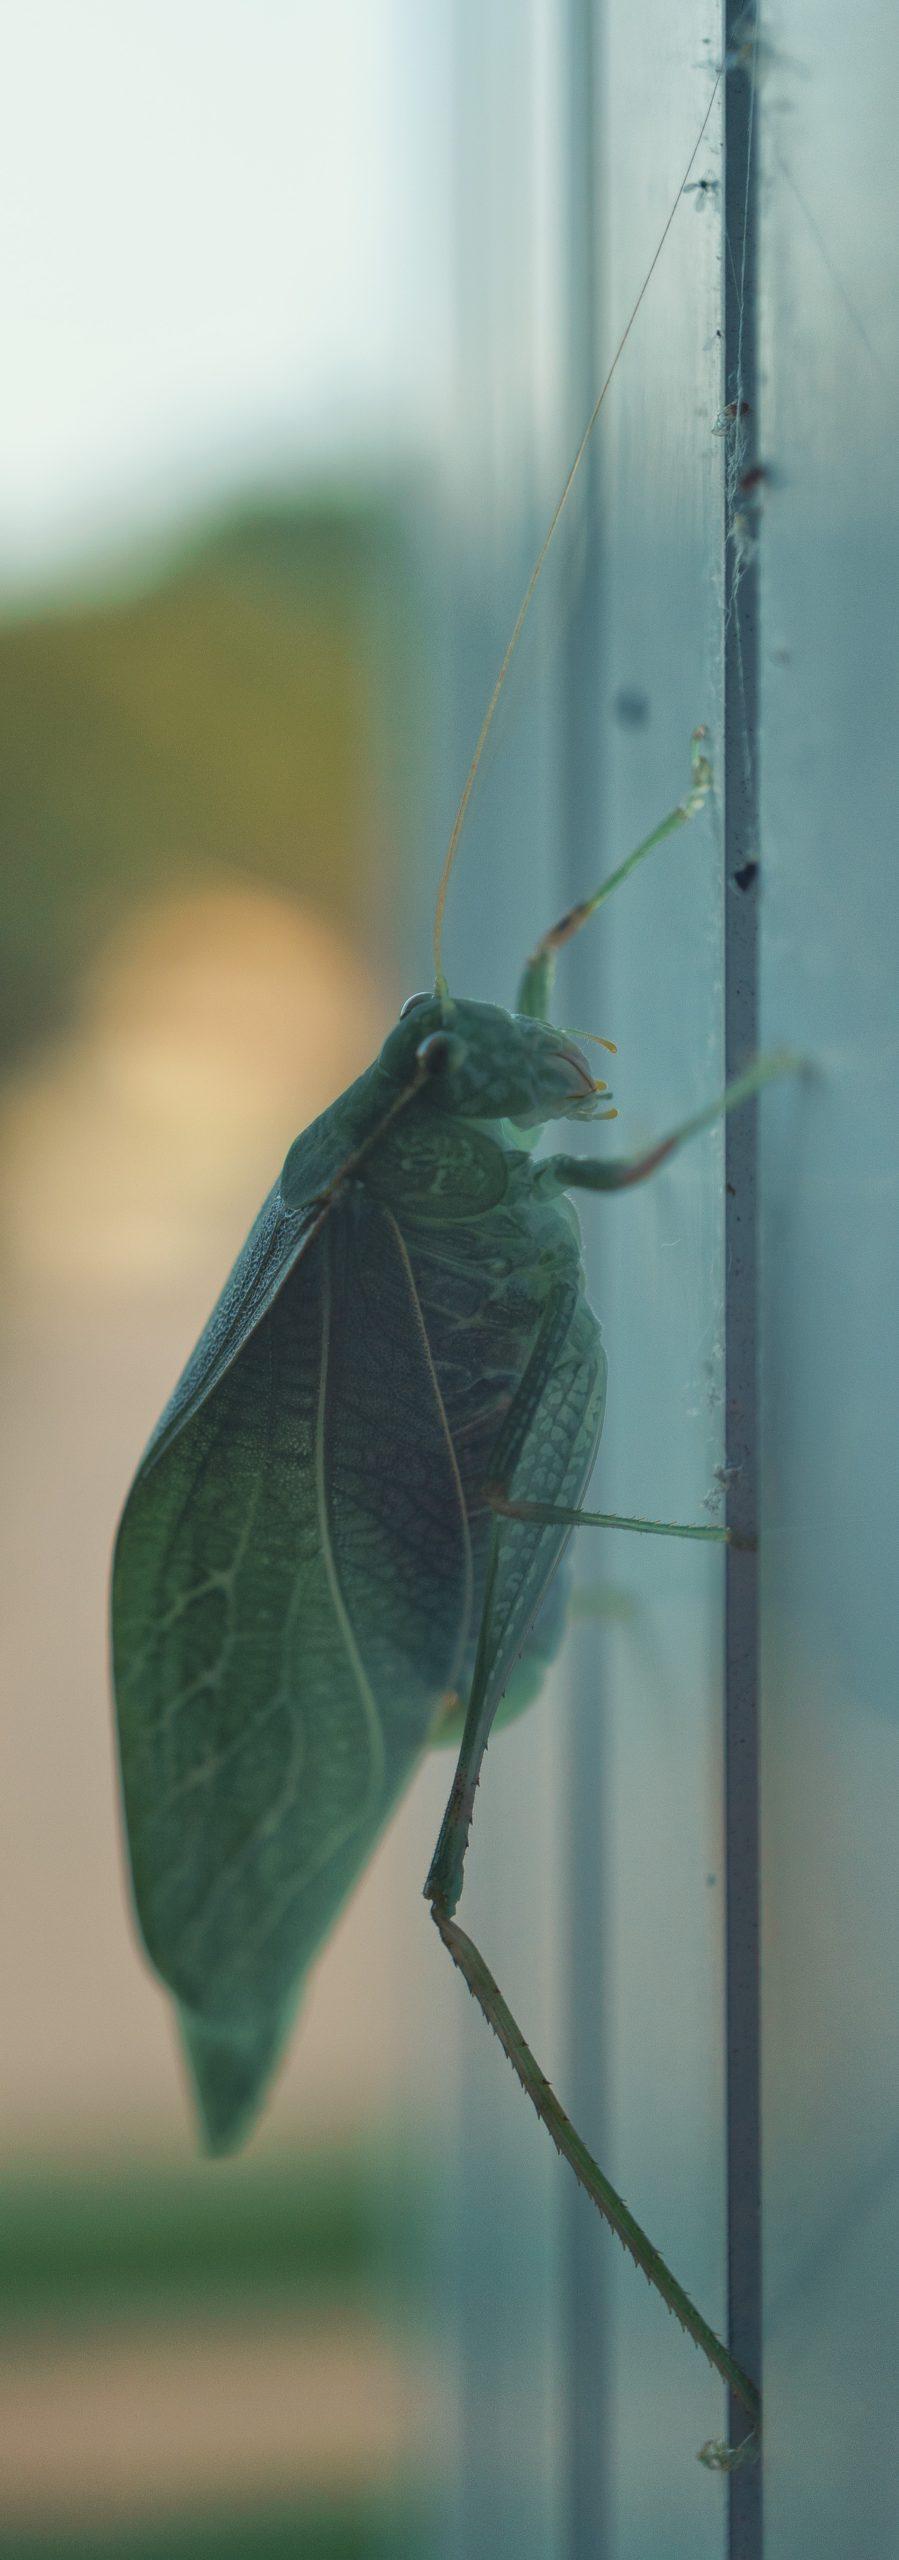 Katydid in profile